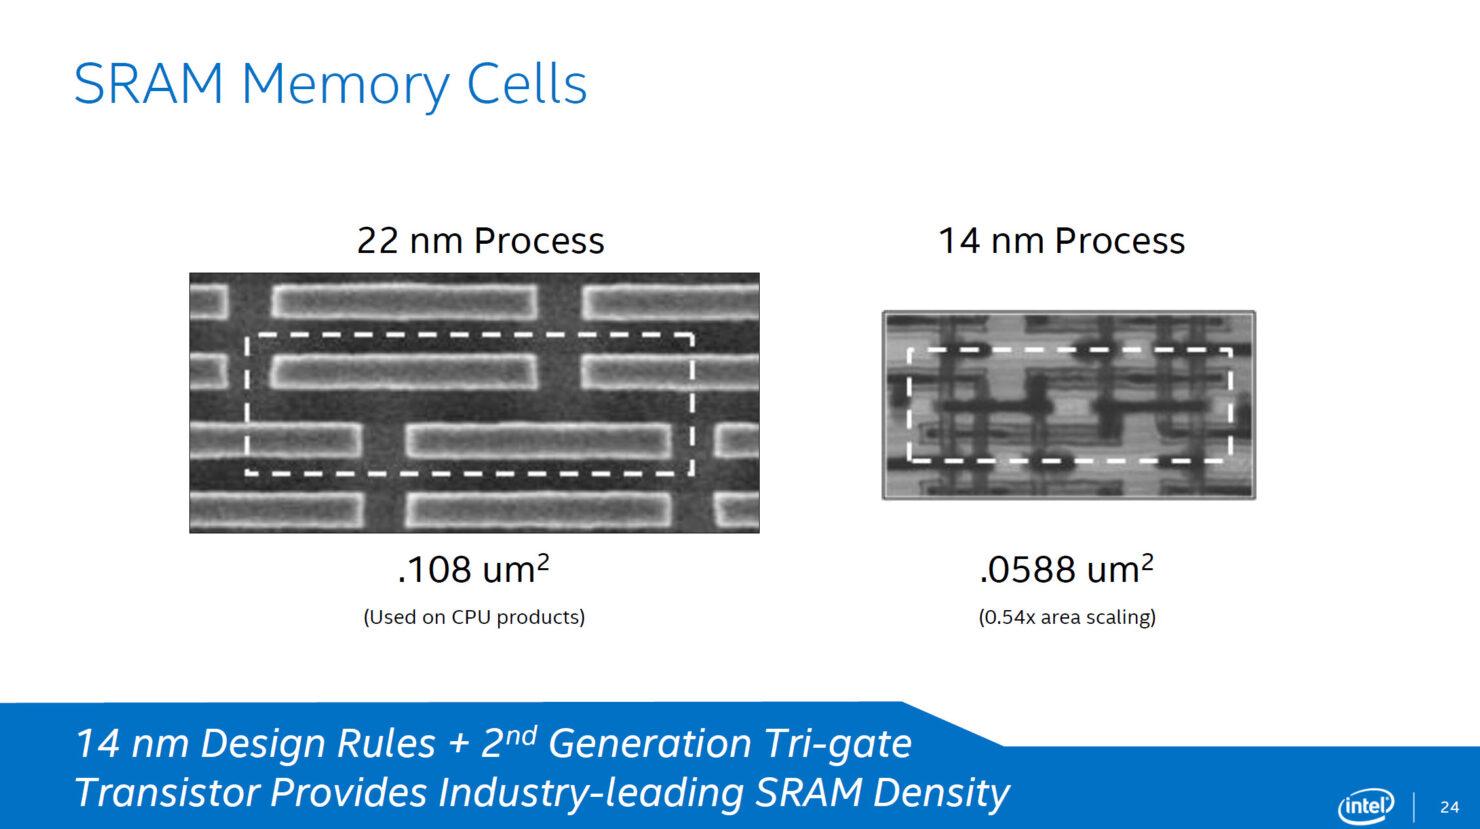 intel-broadwell-14nm-sram-memory-cells